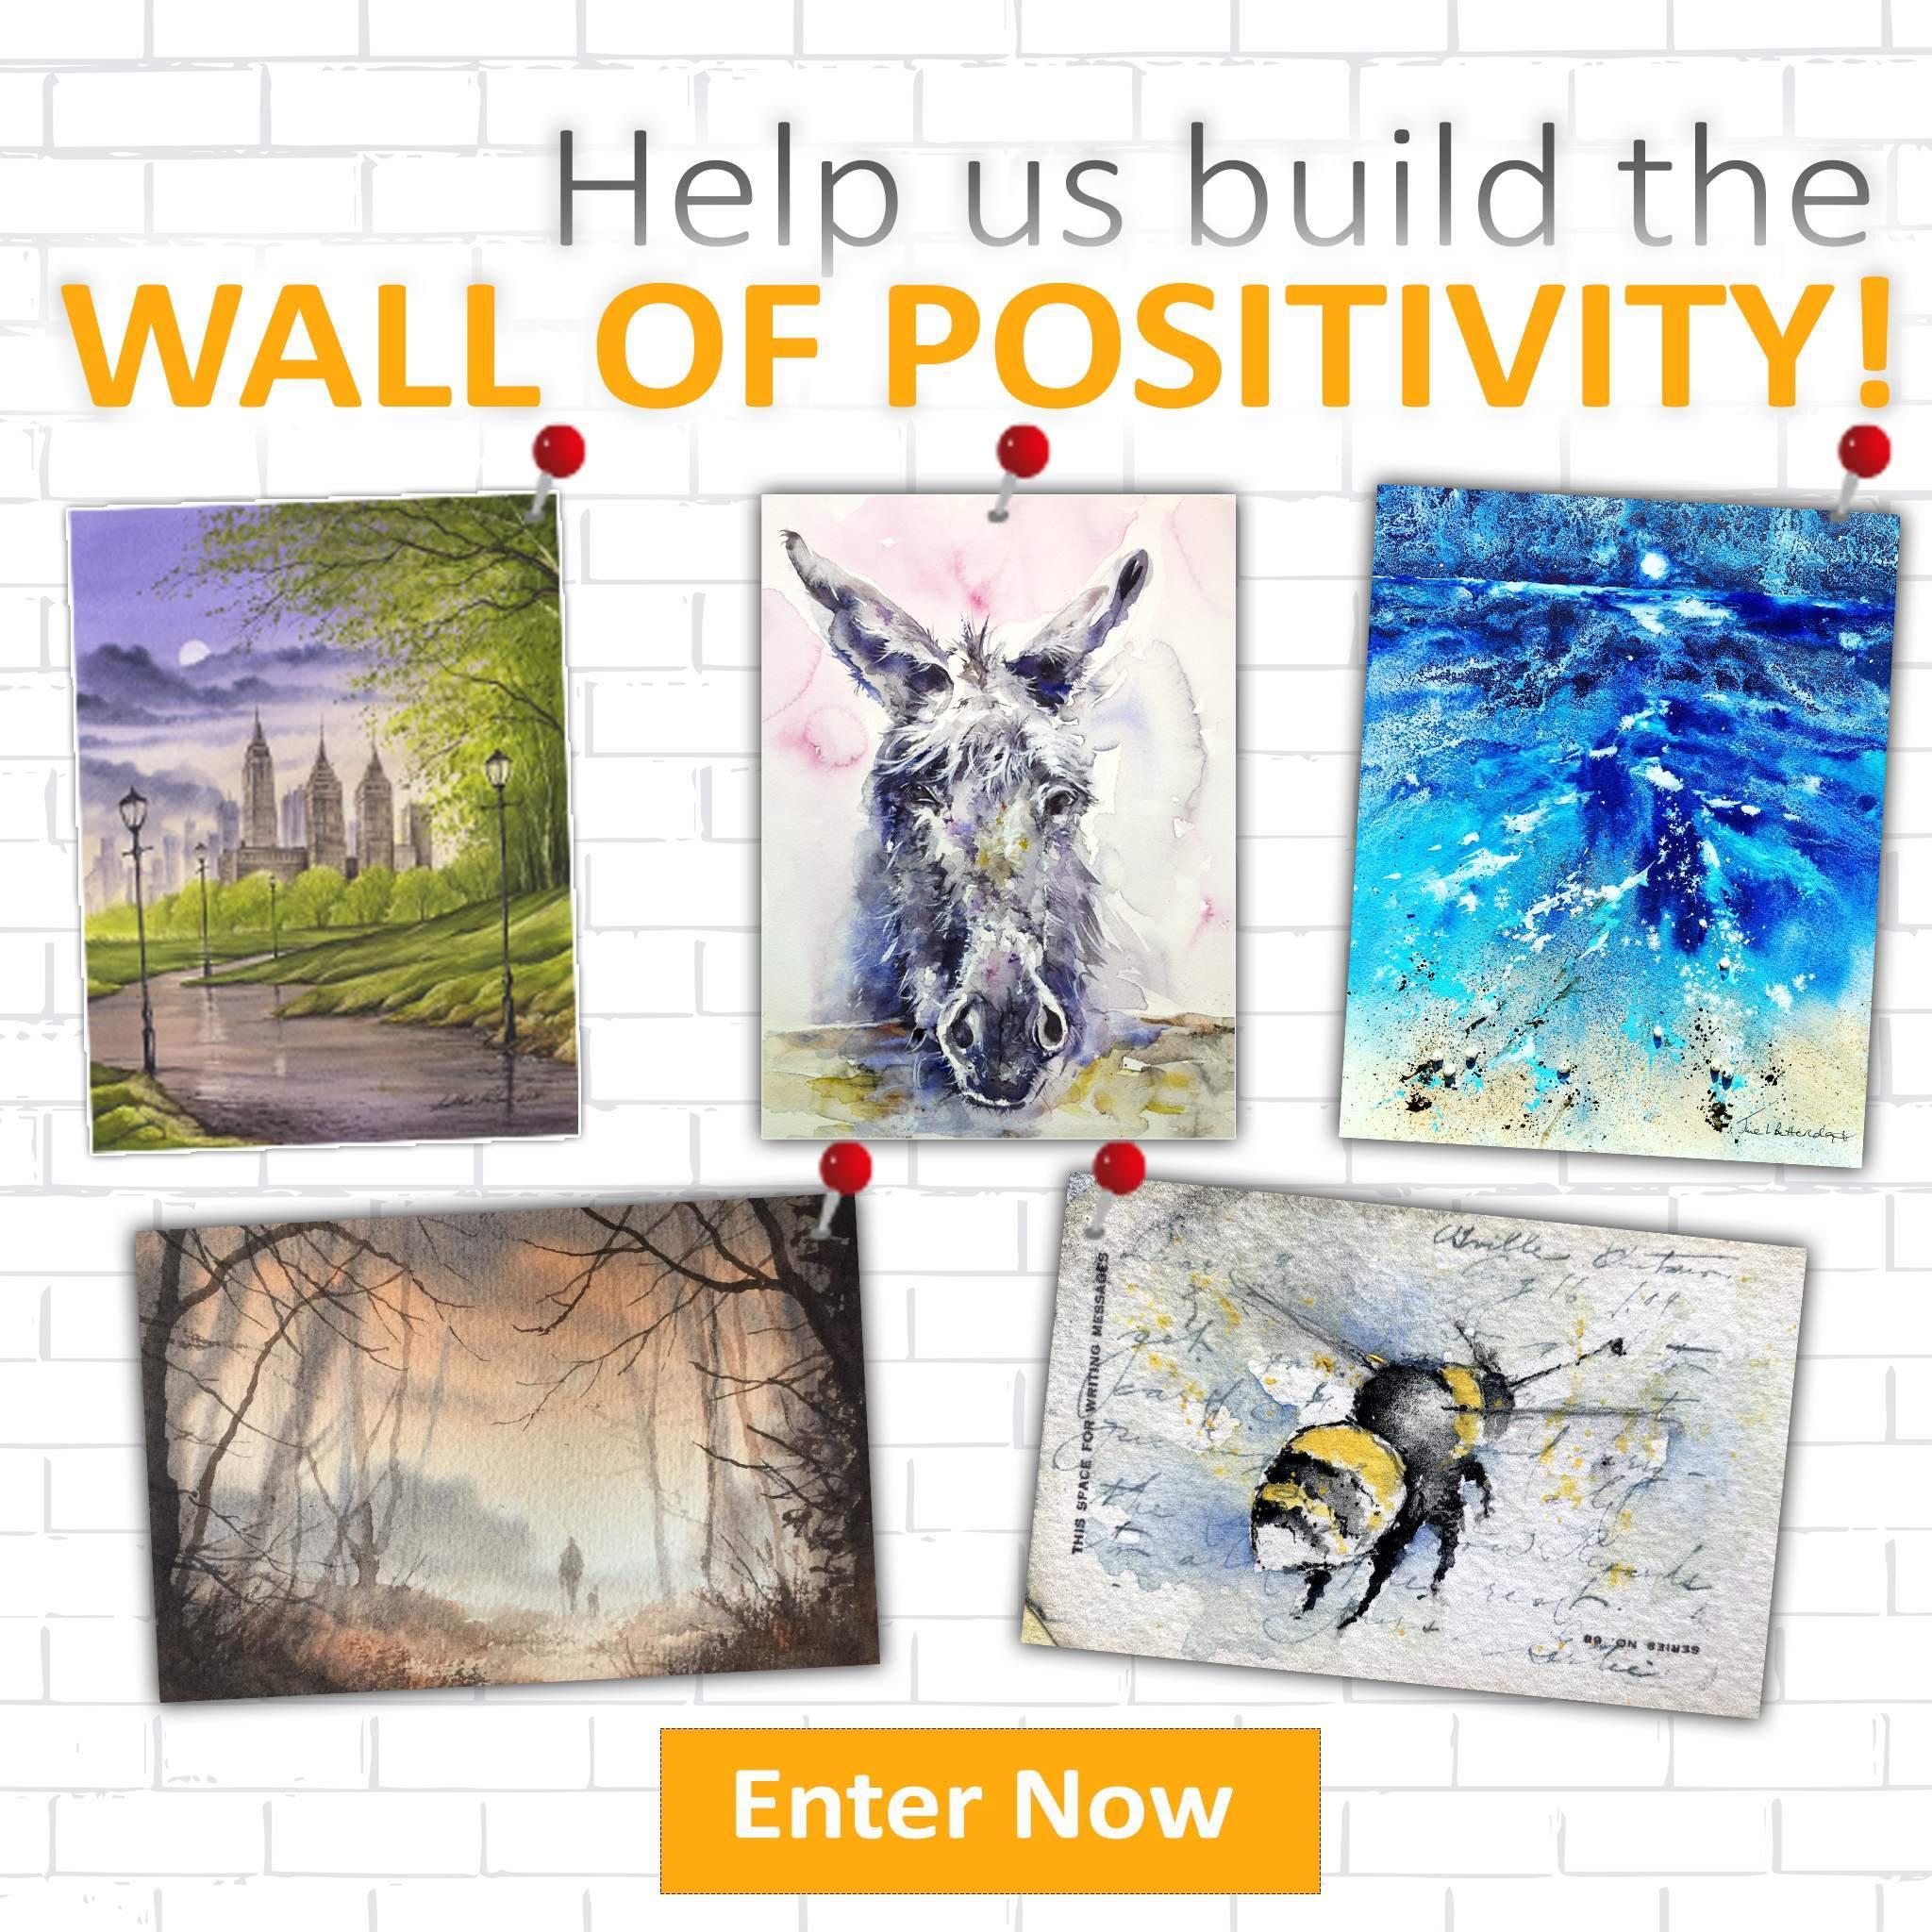 Wall of Positivity